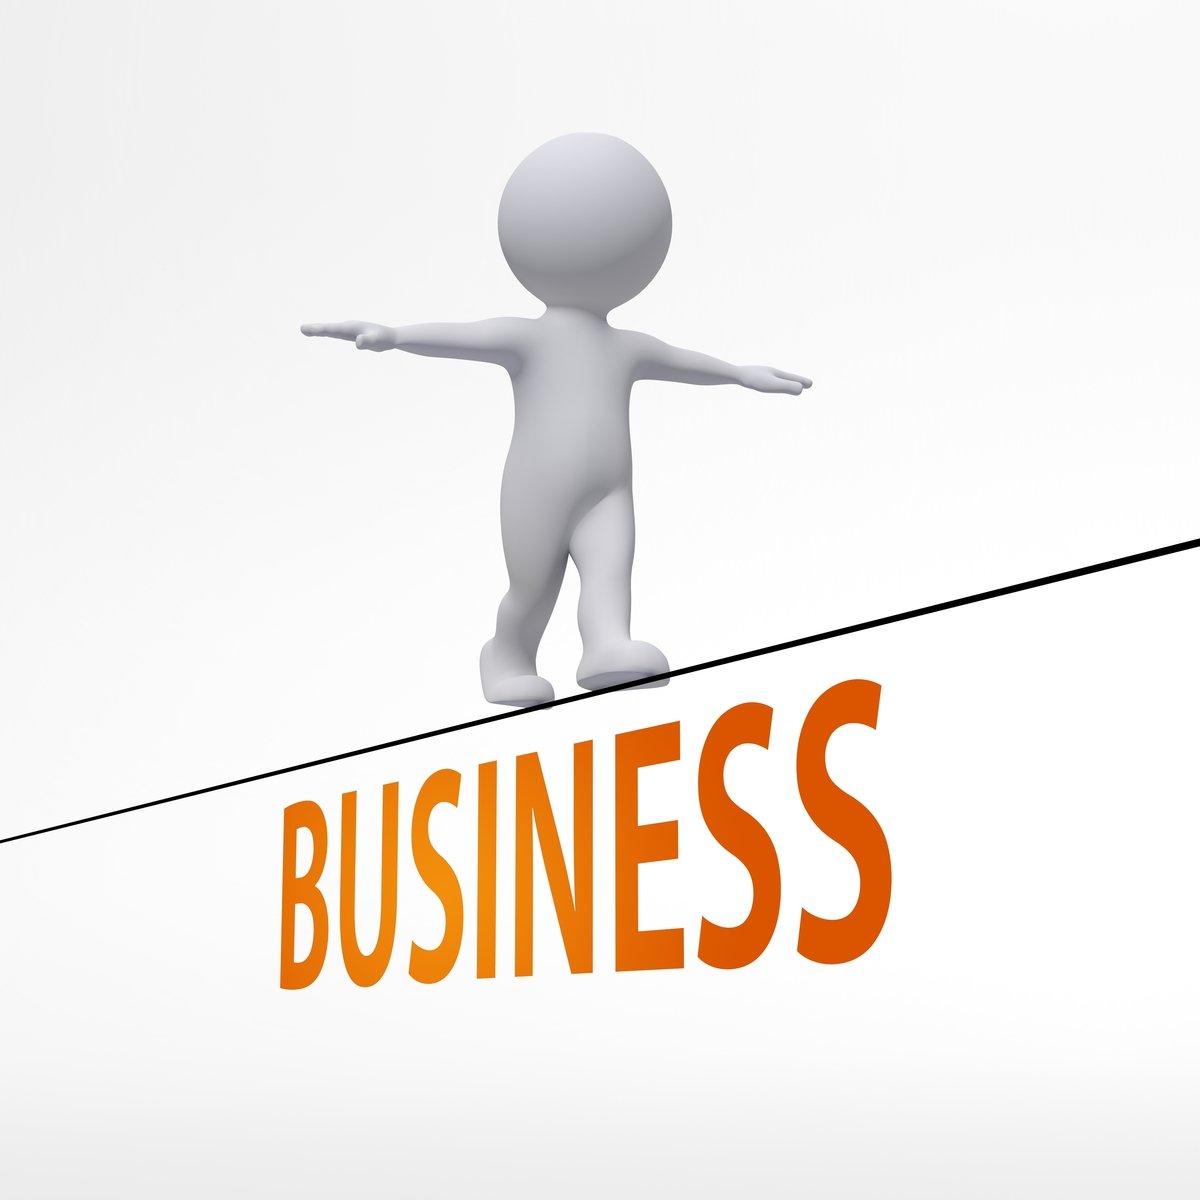 free business graphics stock photo freeimages com money symbol clipart money symbol clip art powerpoint